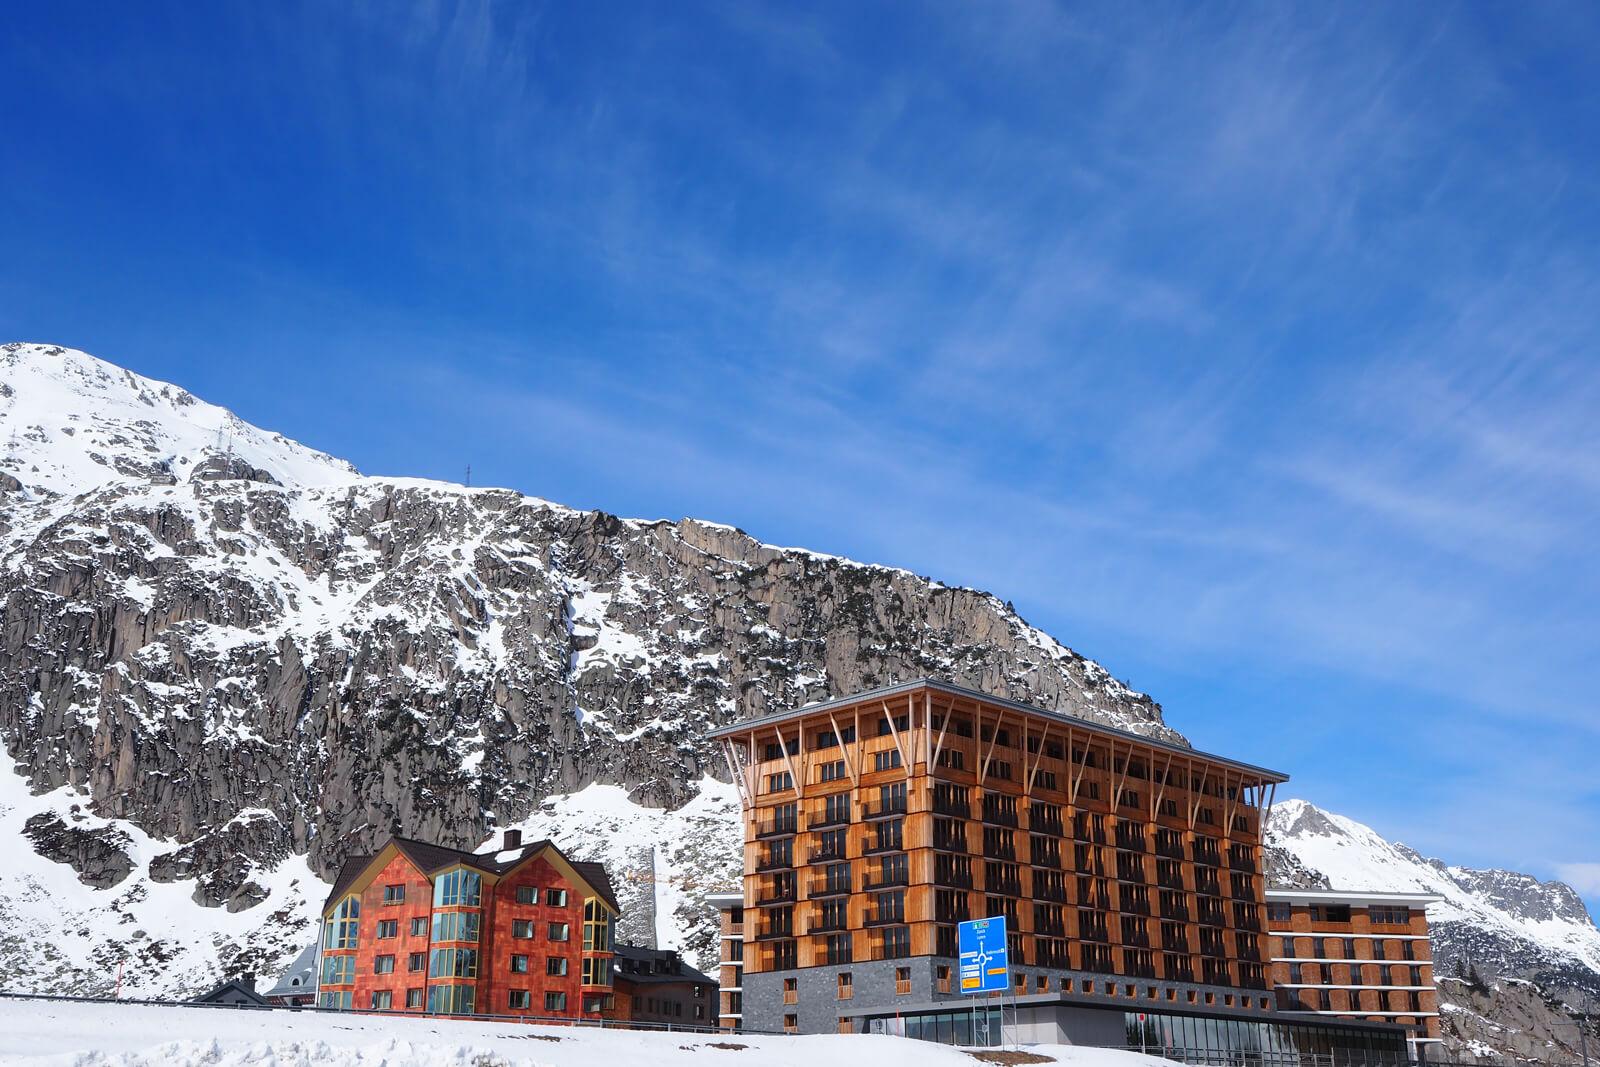 Radisson Blu Hotel in Andermatt